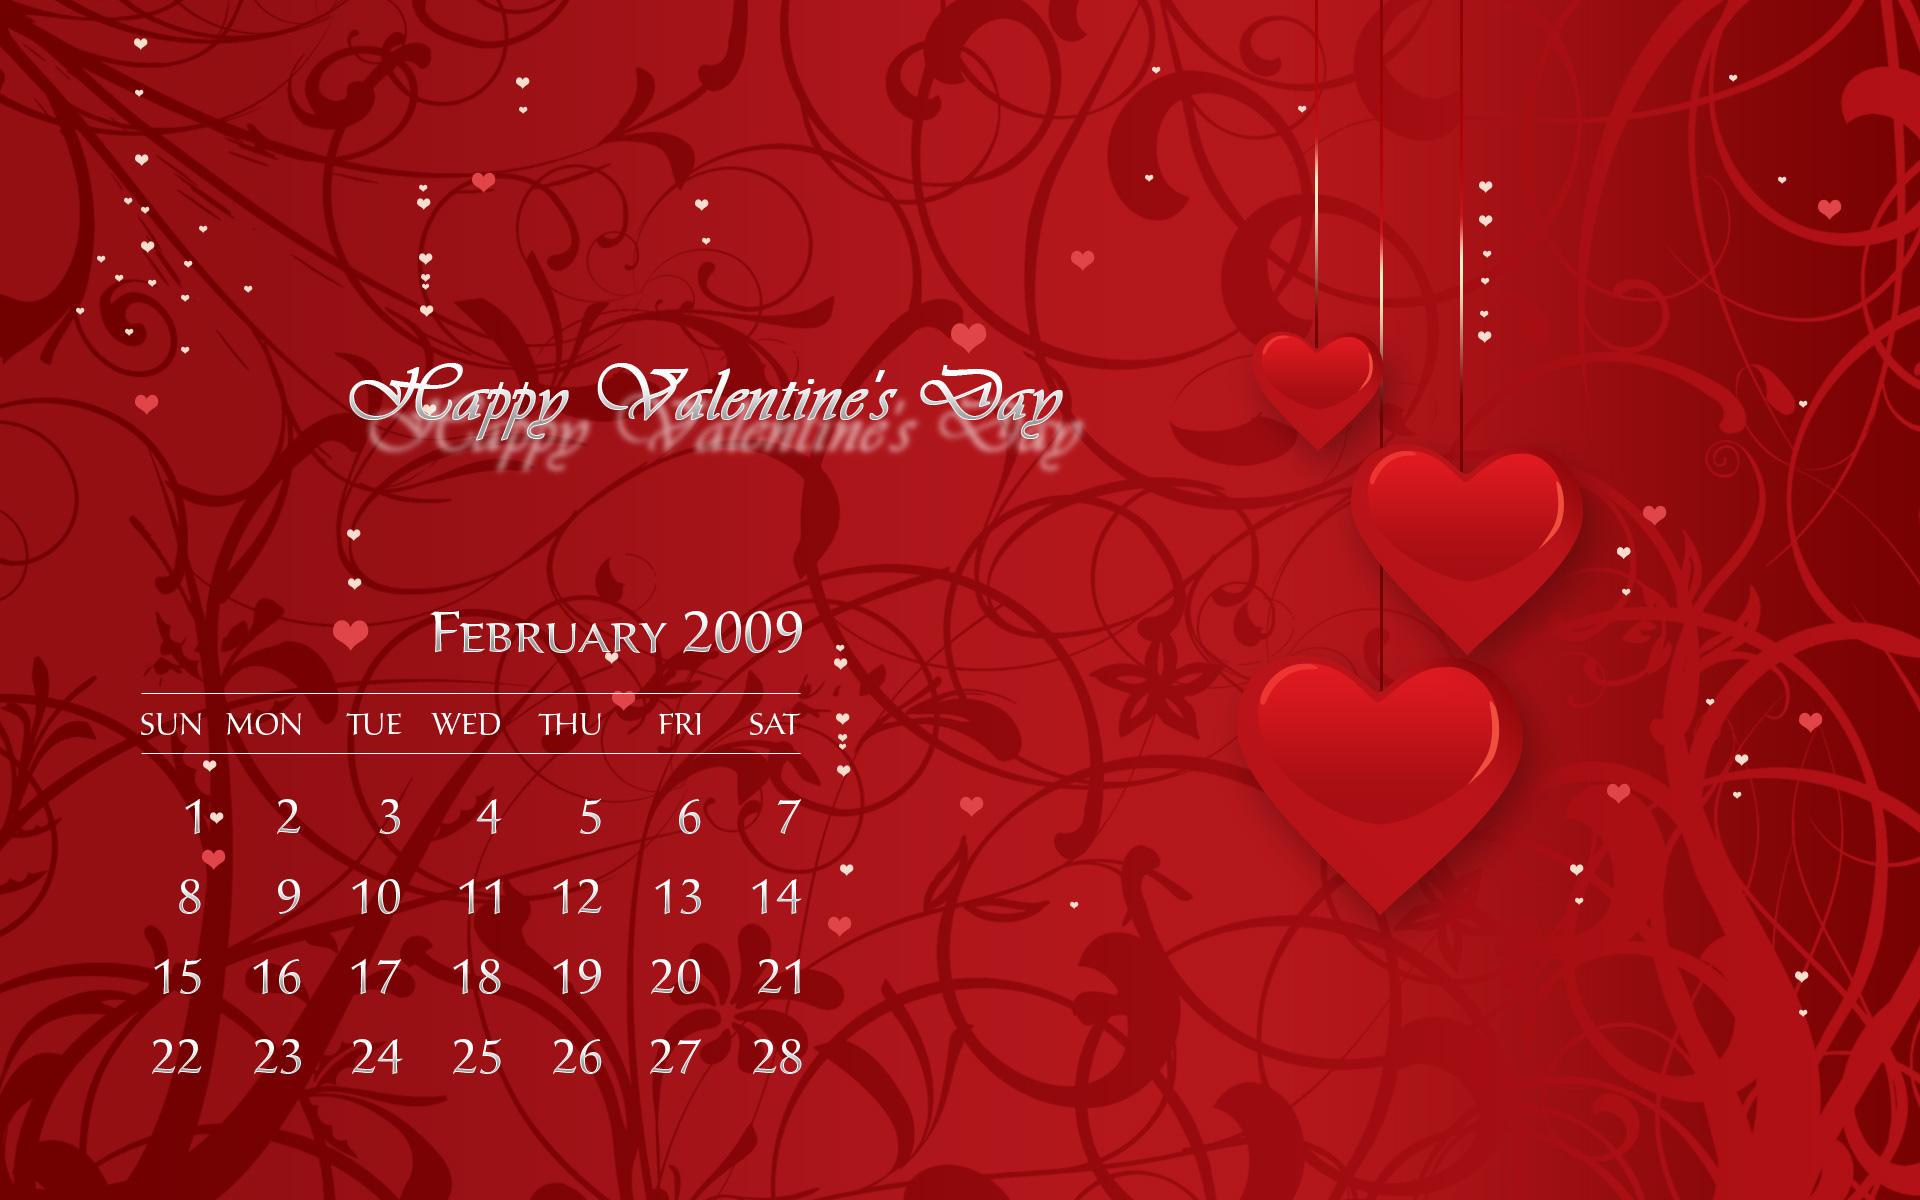 Romantic February 2009 Calendar Wallpaper Photoshop 1920x1200